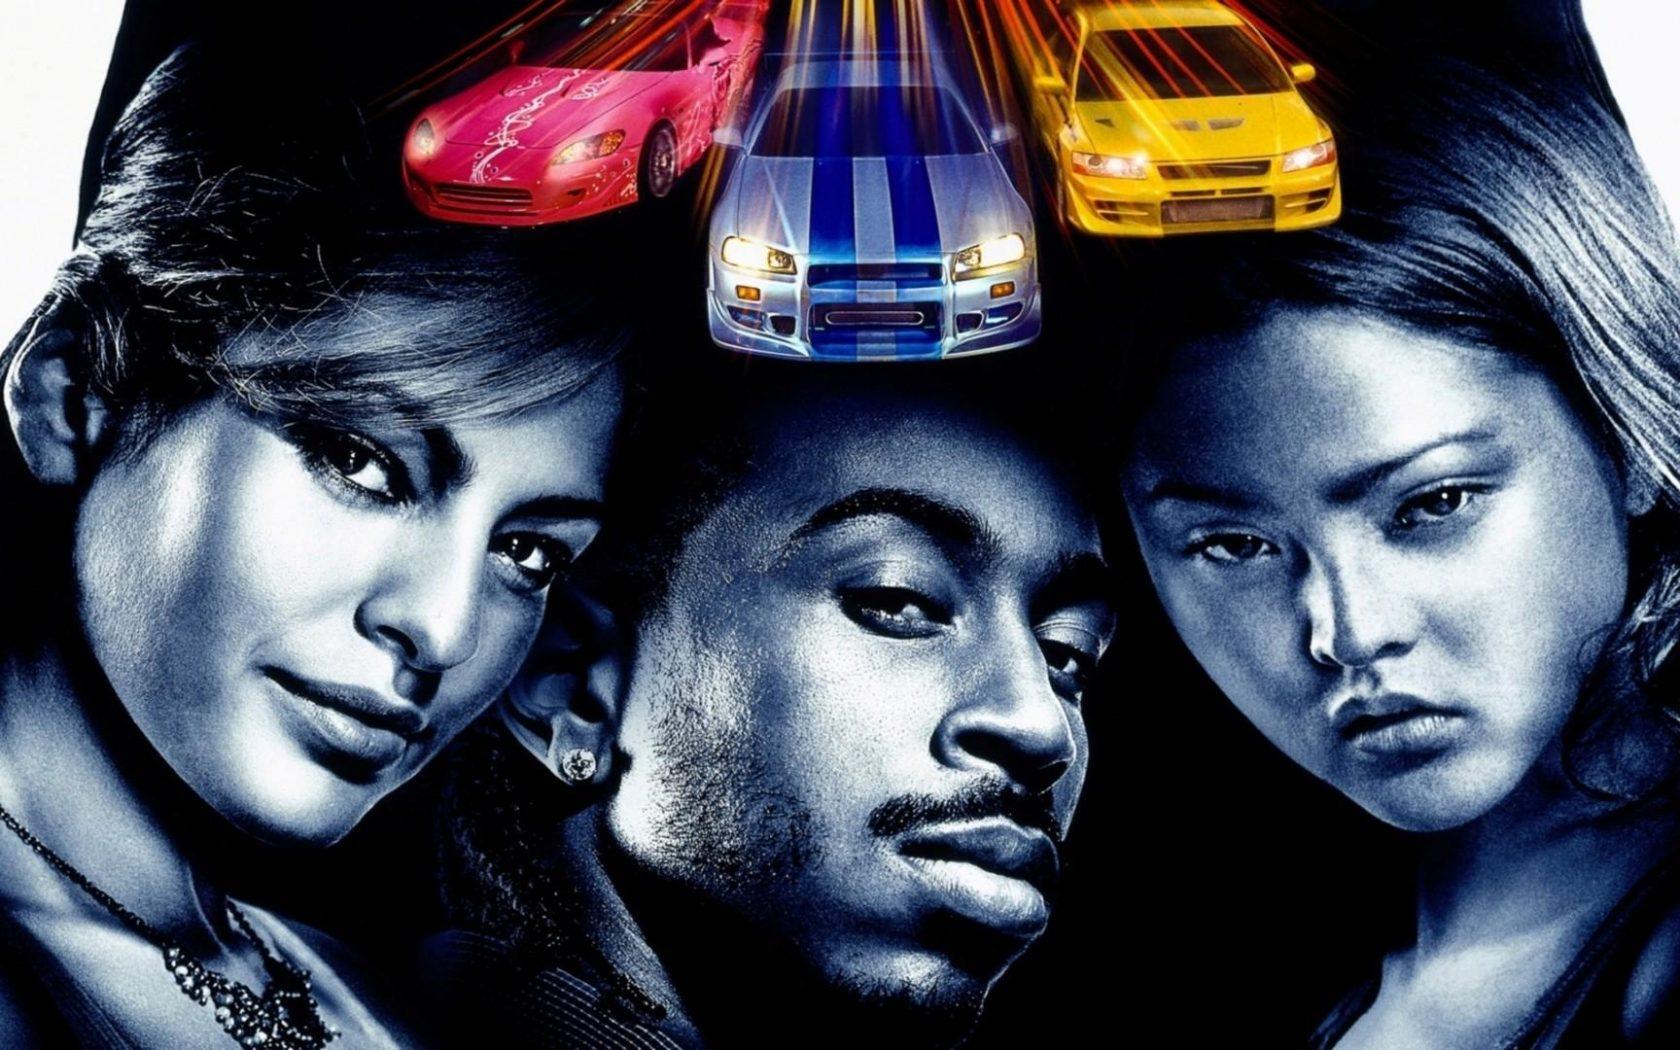 Fast Cars And Girls Wallpaper 2 Fast 2 Furious 2003 Hd Wallpaper